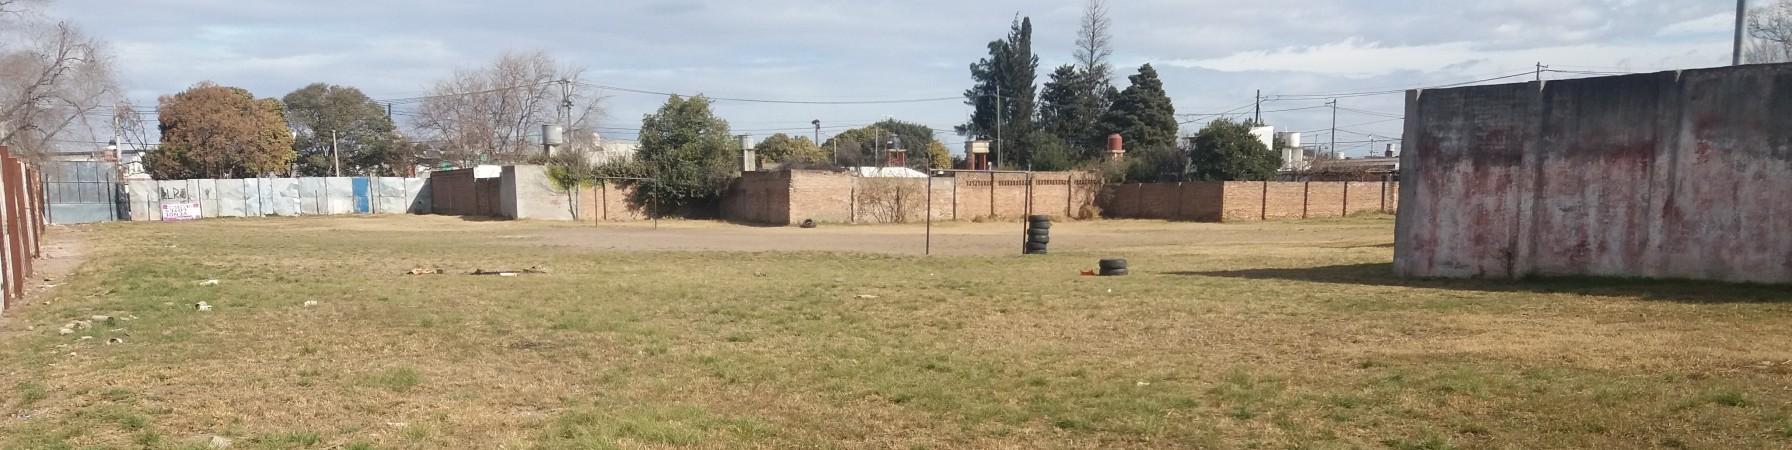 Loteo en Villa Aspacia  Aviador Pettirossi 2800  escritura